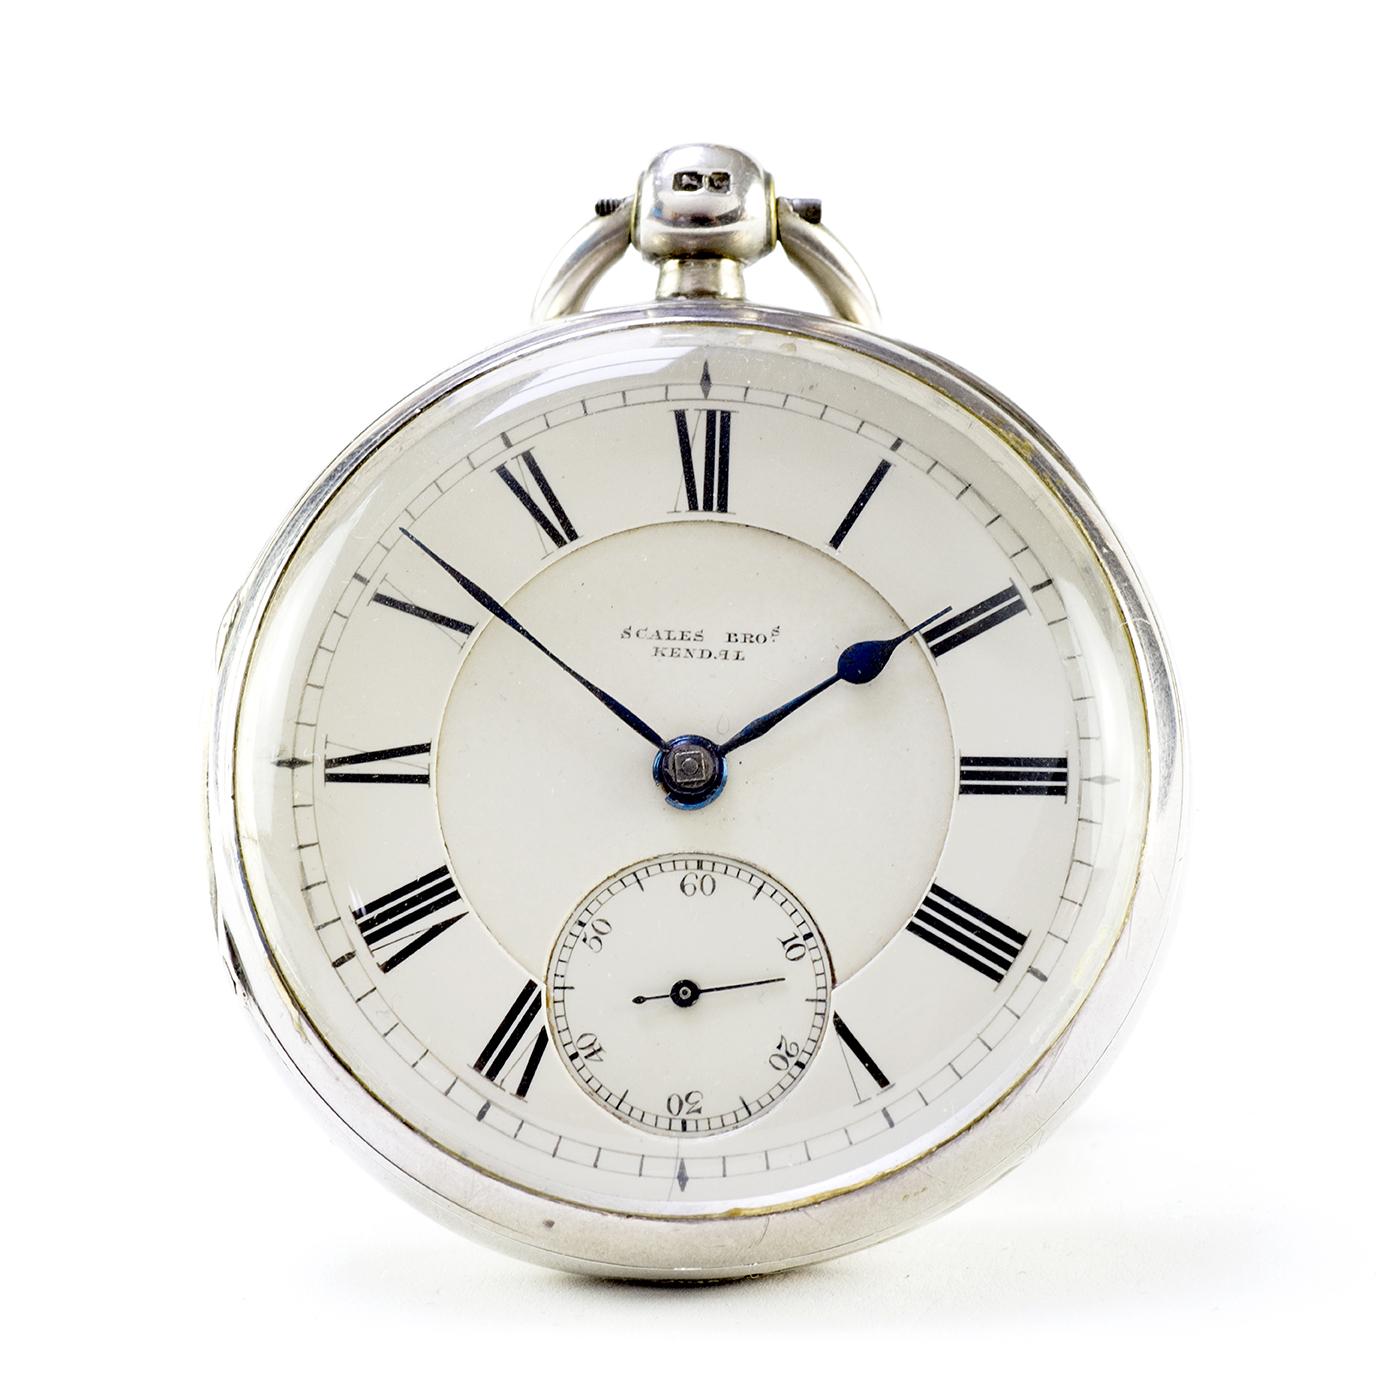 SCALES BROTHERS (Kendal). Reloj de Bolsillo, lepine, Half Fusee (SemiCatalino). Londres, 1871.